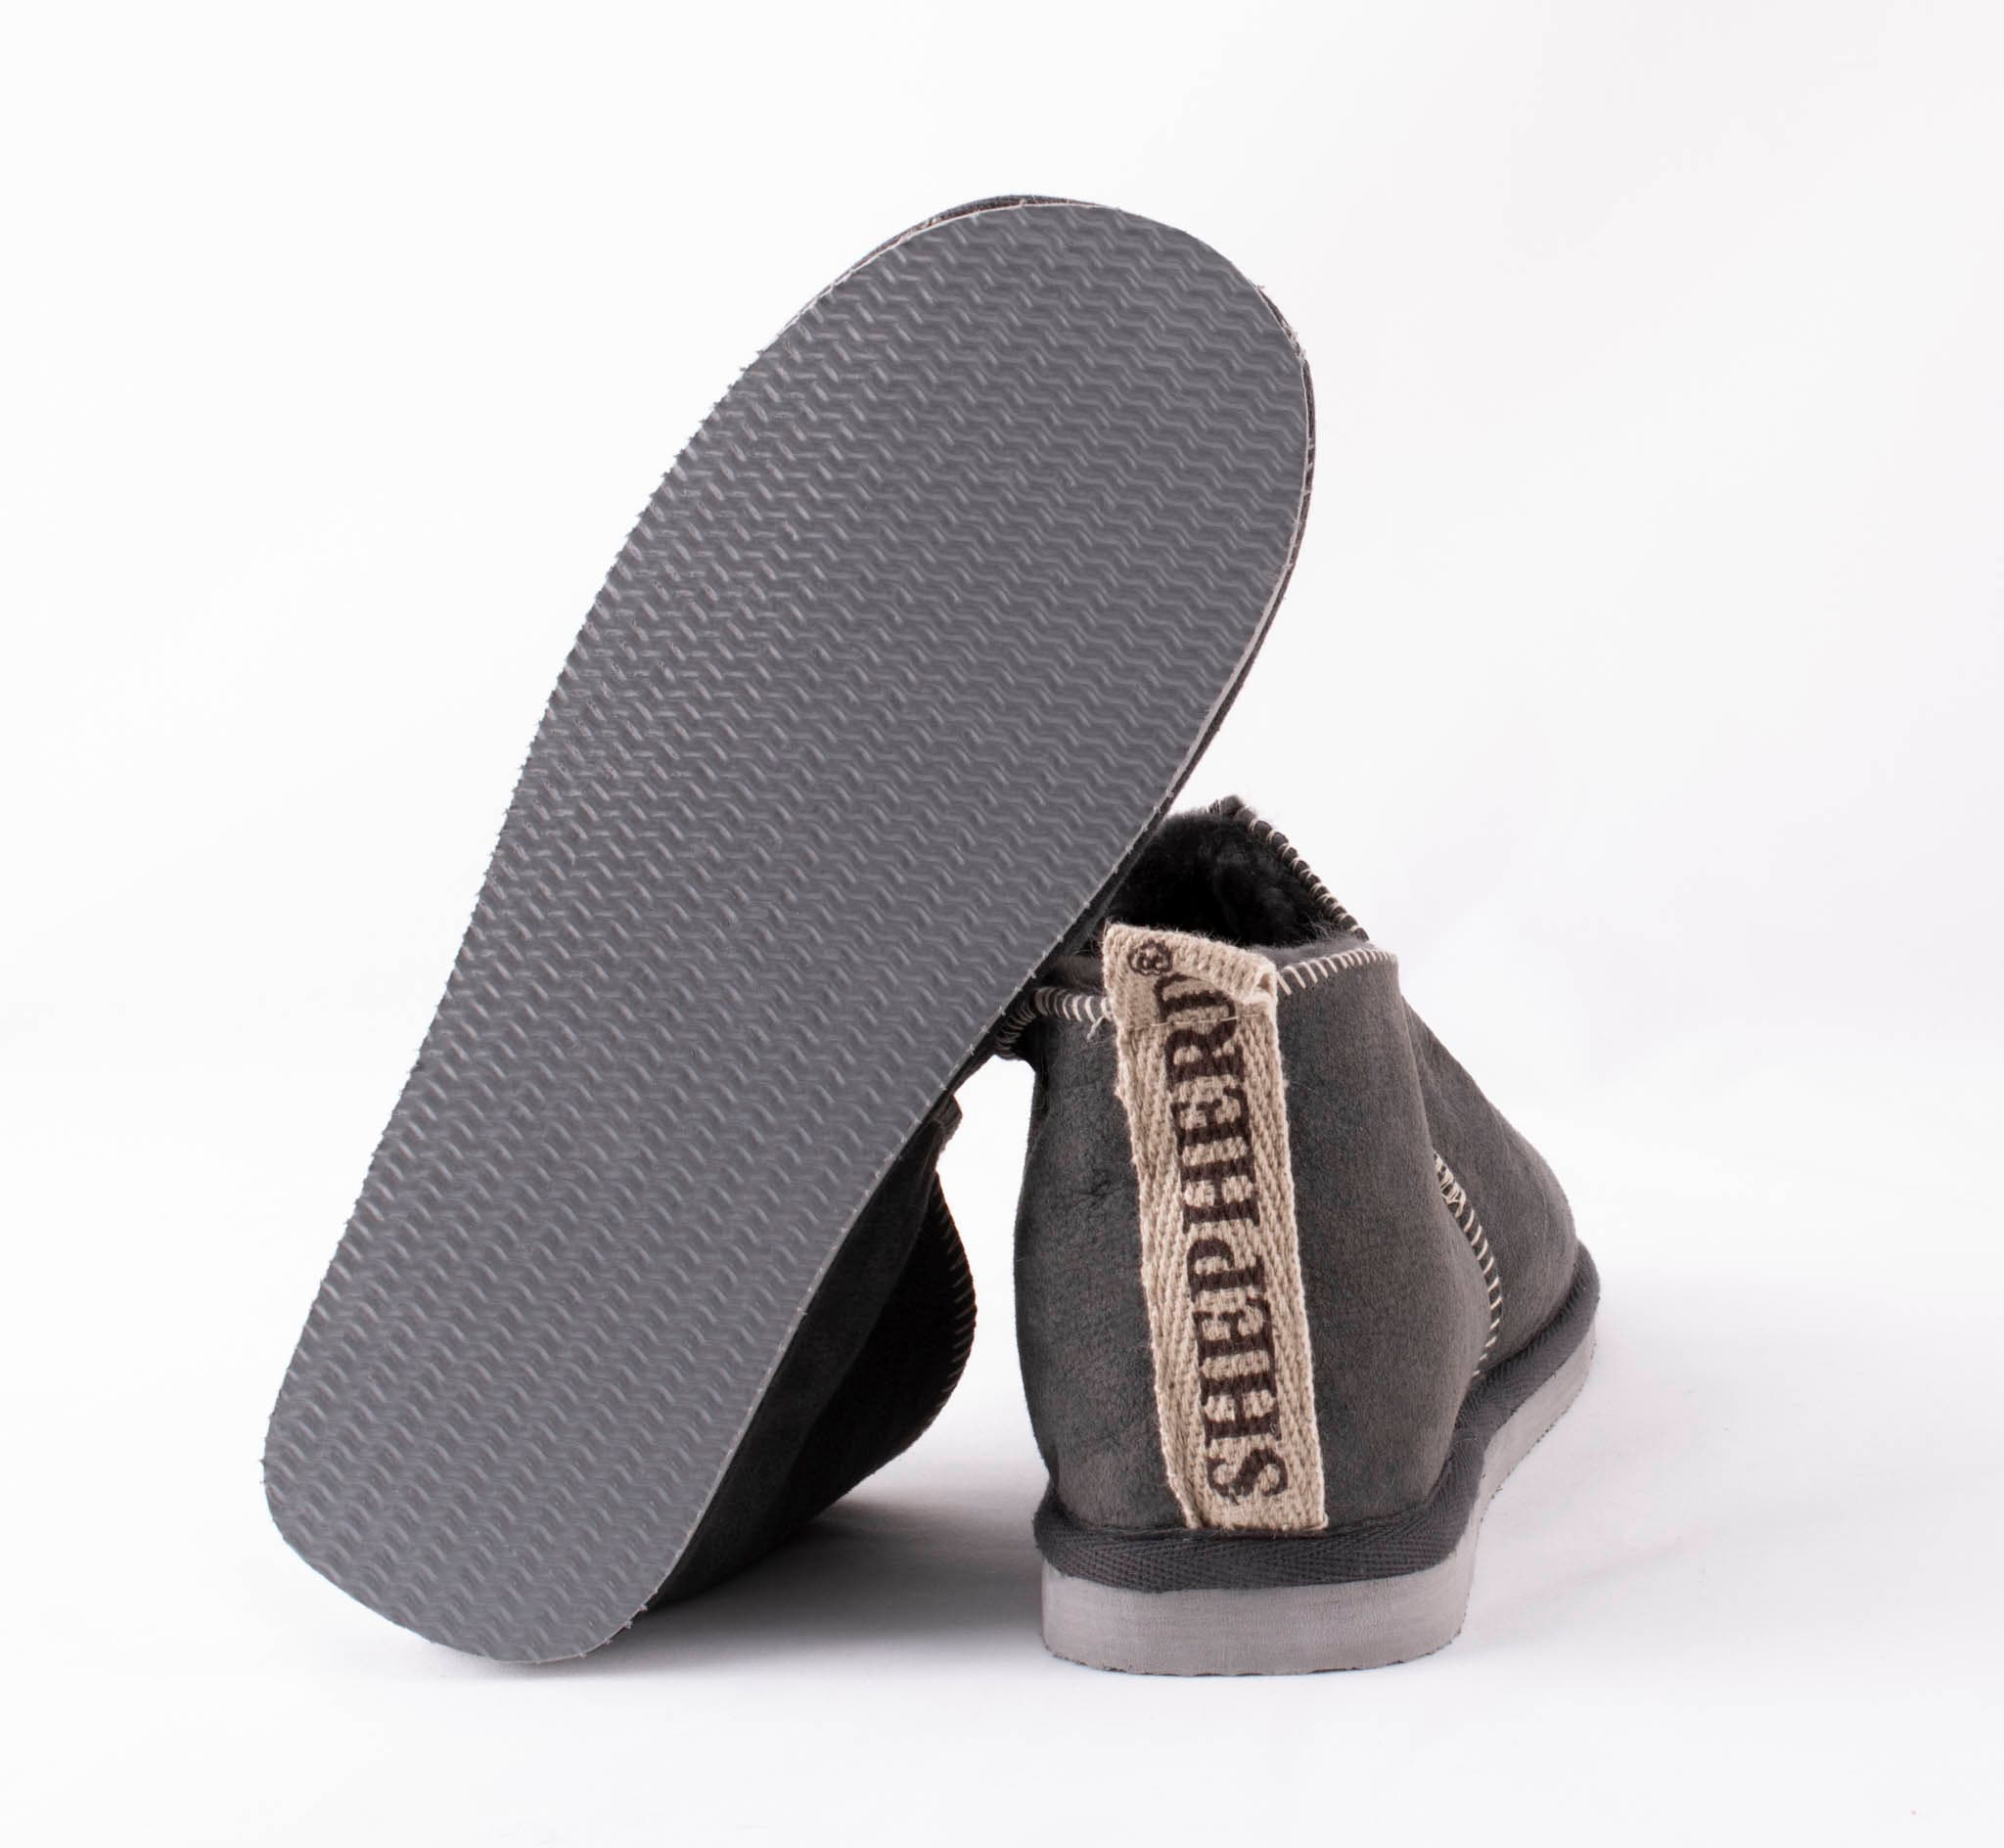 Shepherd Louise slippers